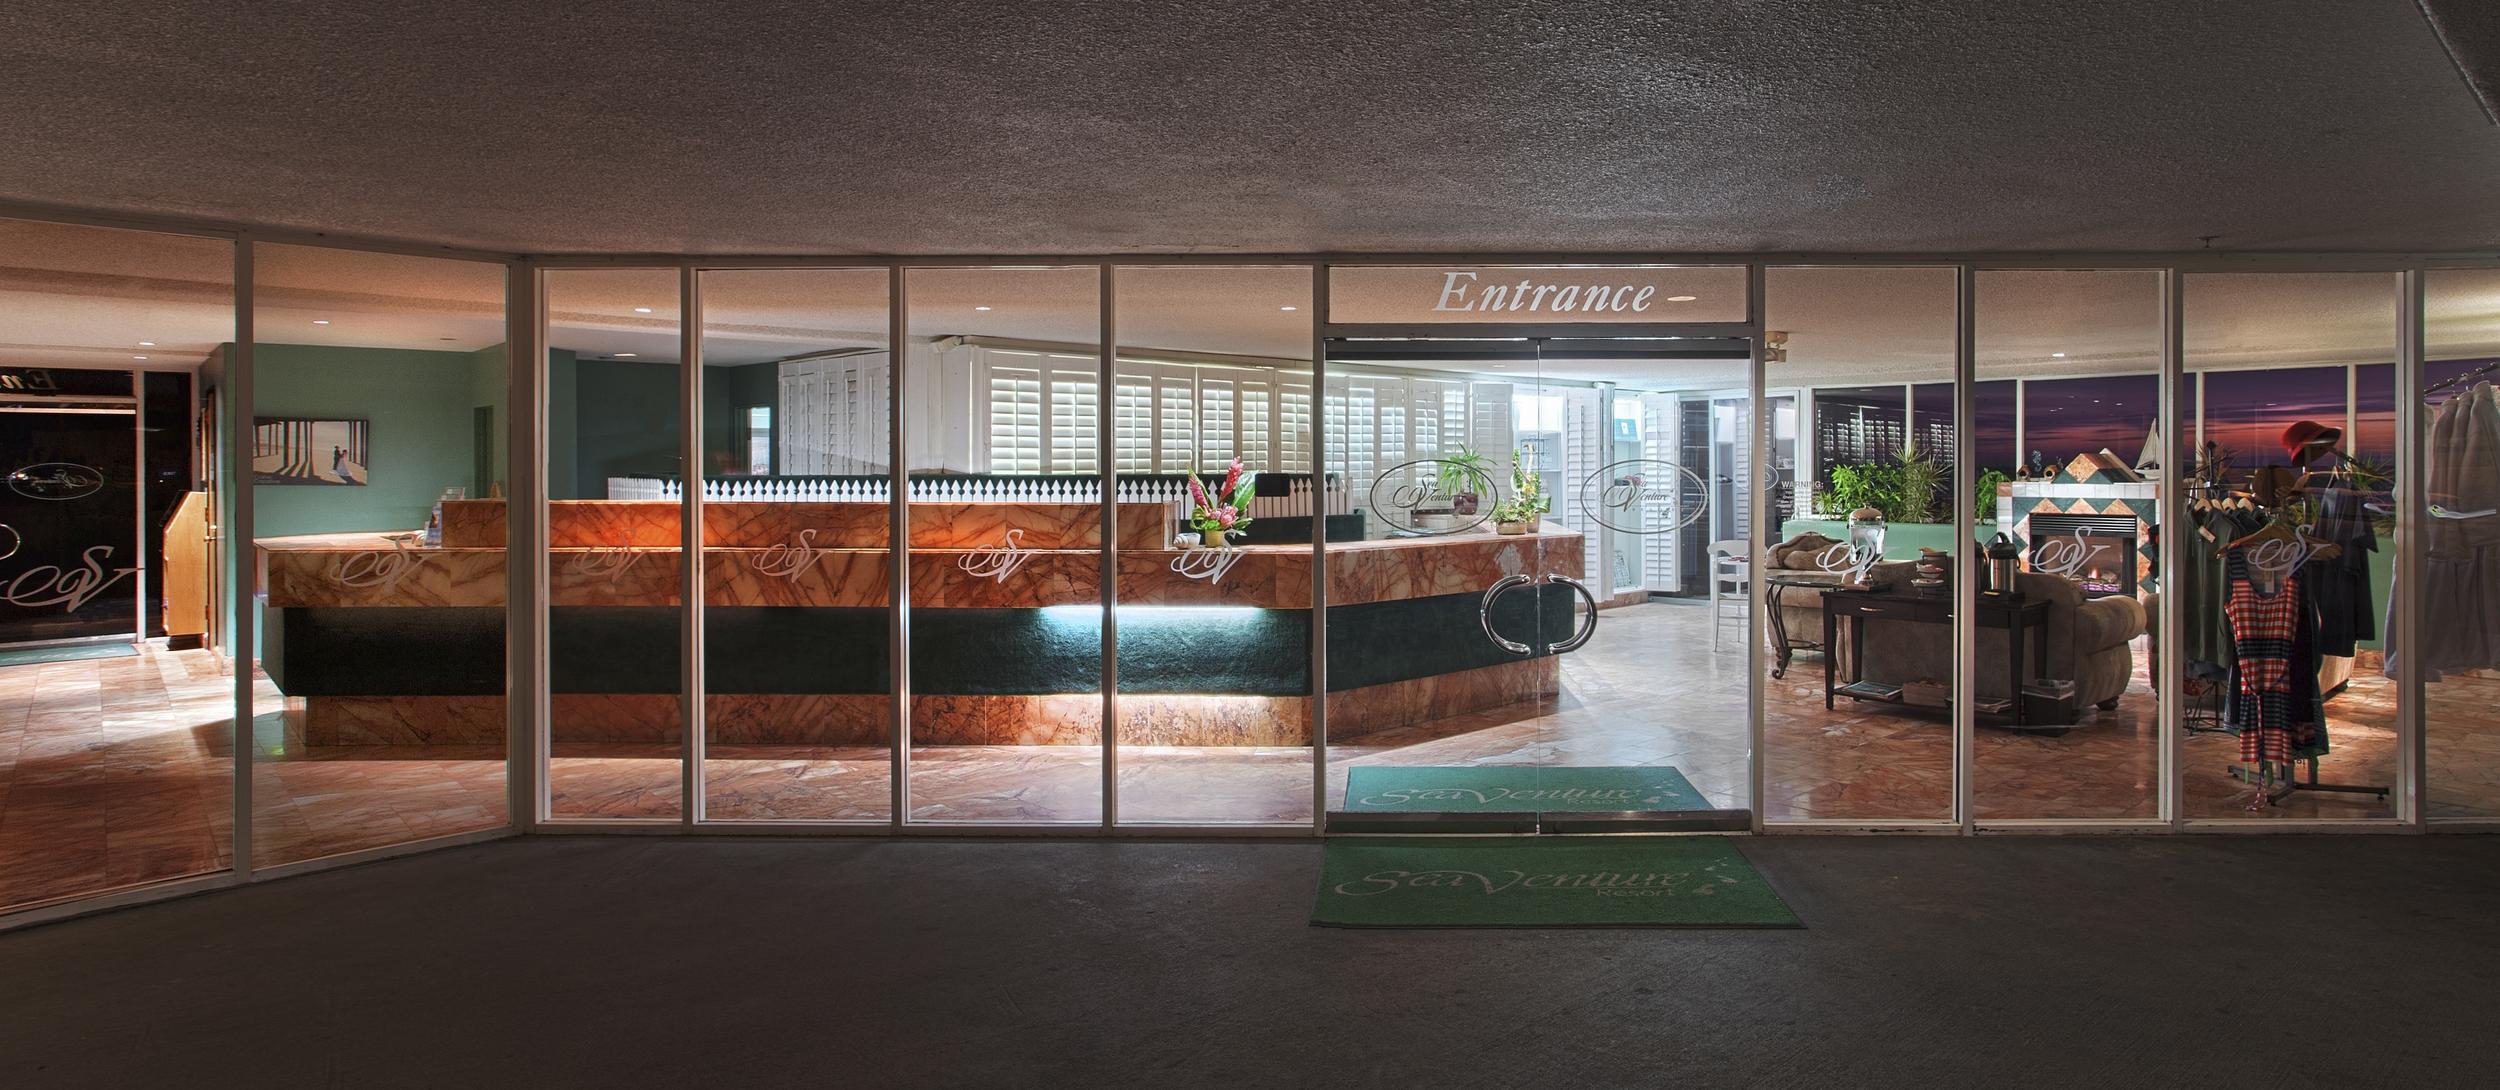 Lobby Entry.jpg